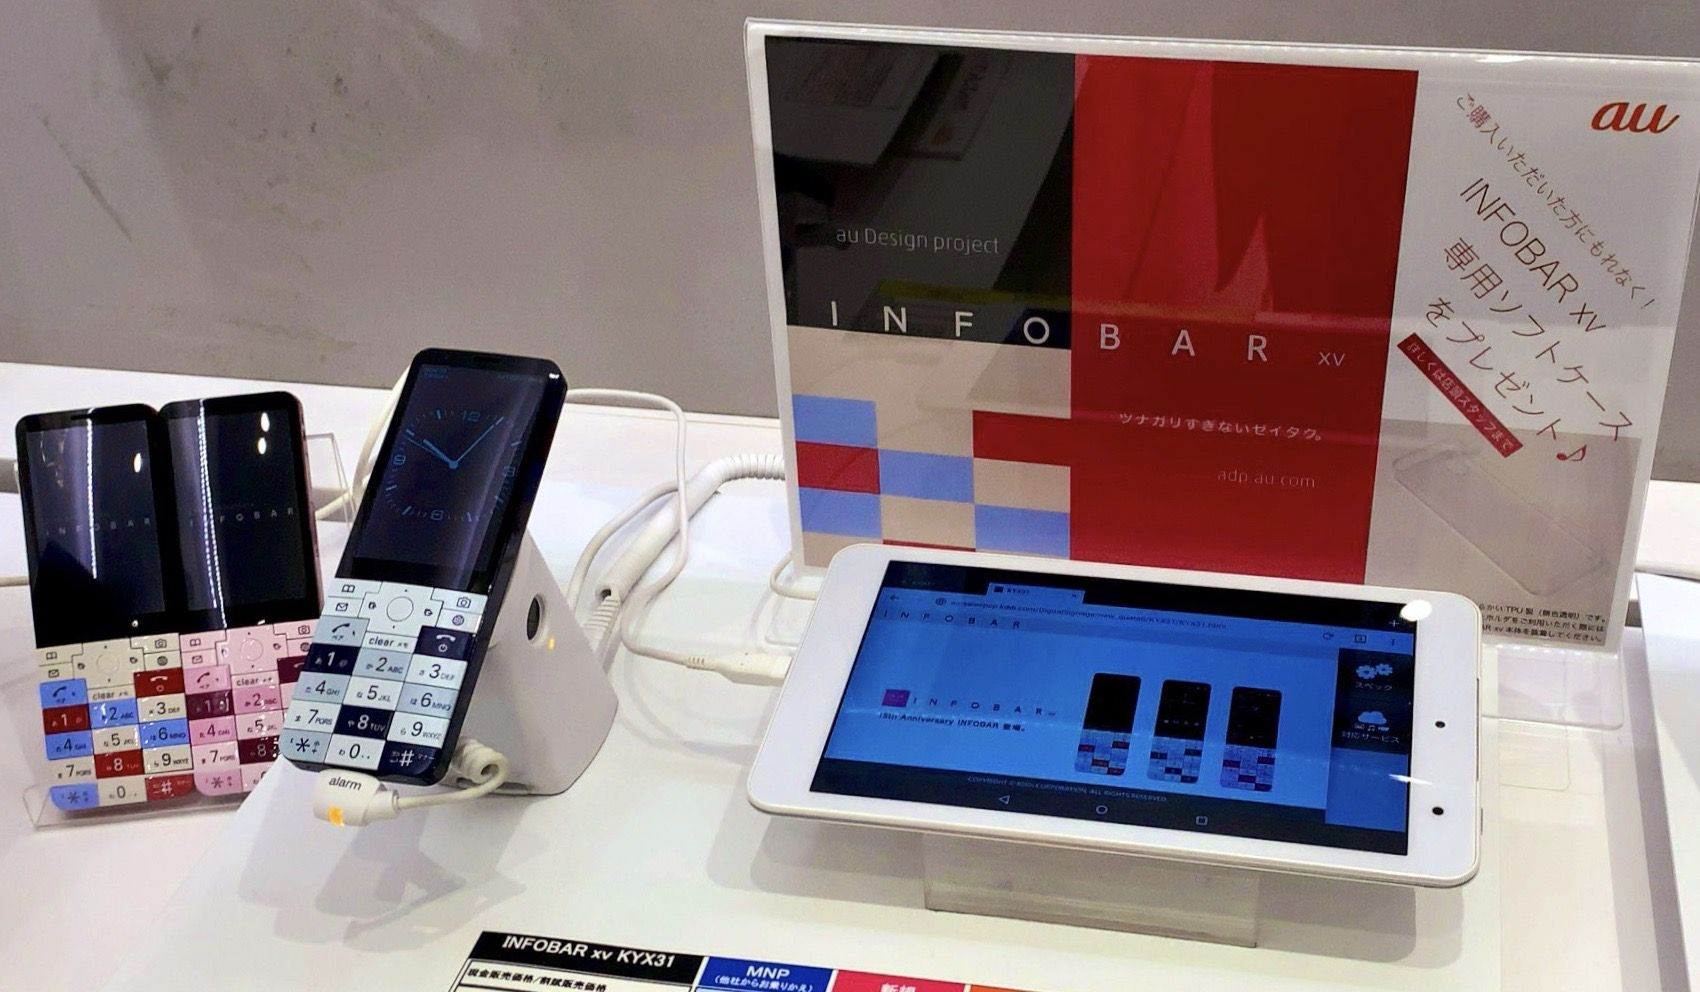 INFOBAR xv の実機設置店舗